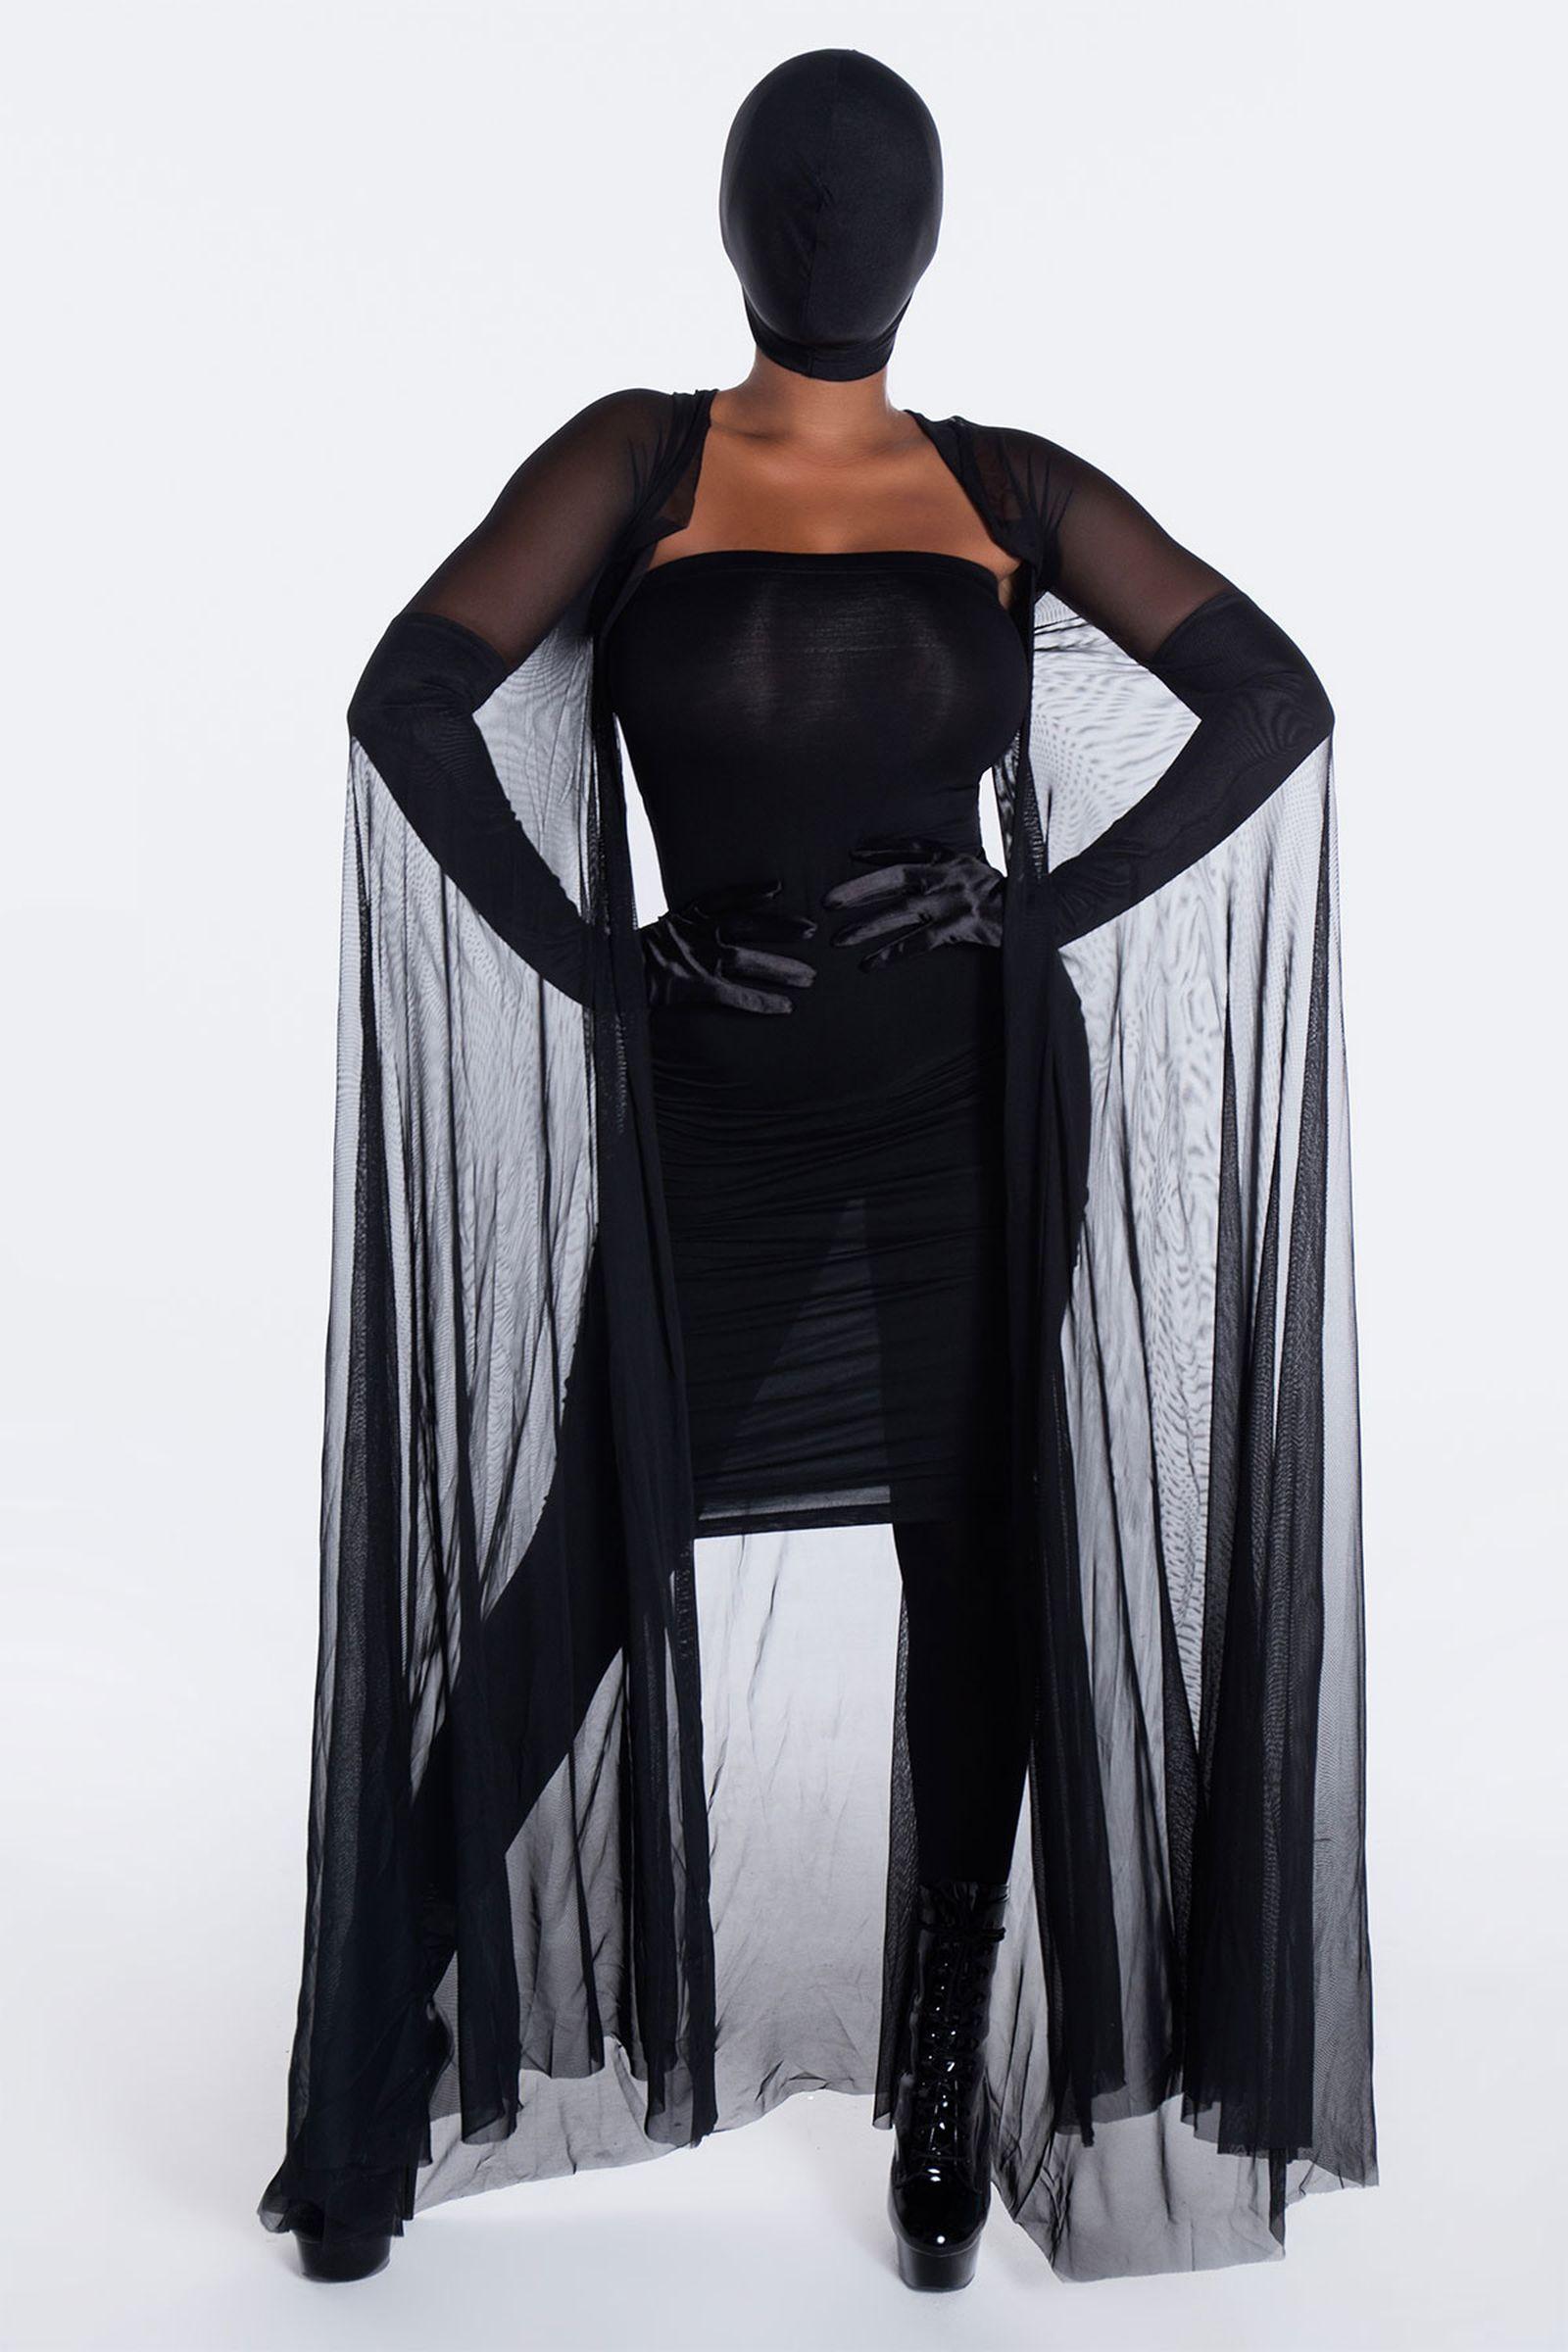 kim-kardashian-halloween-costume-01